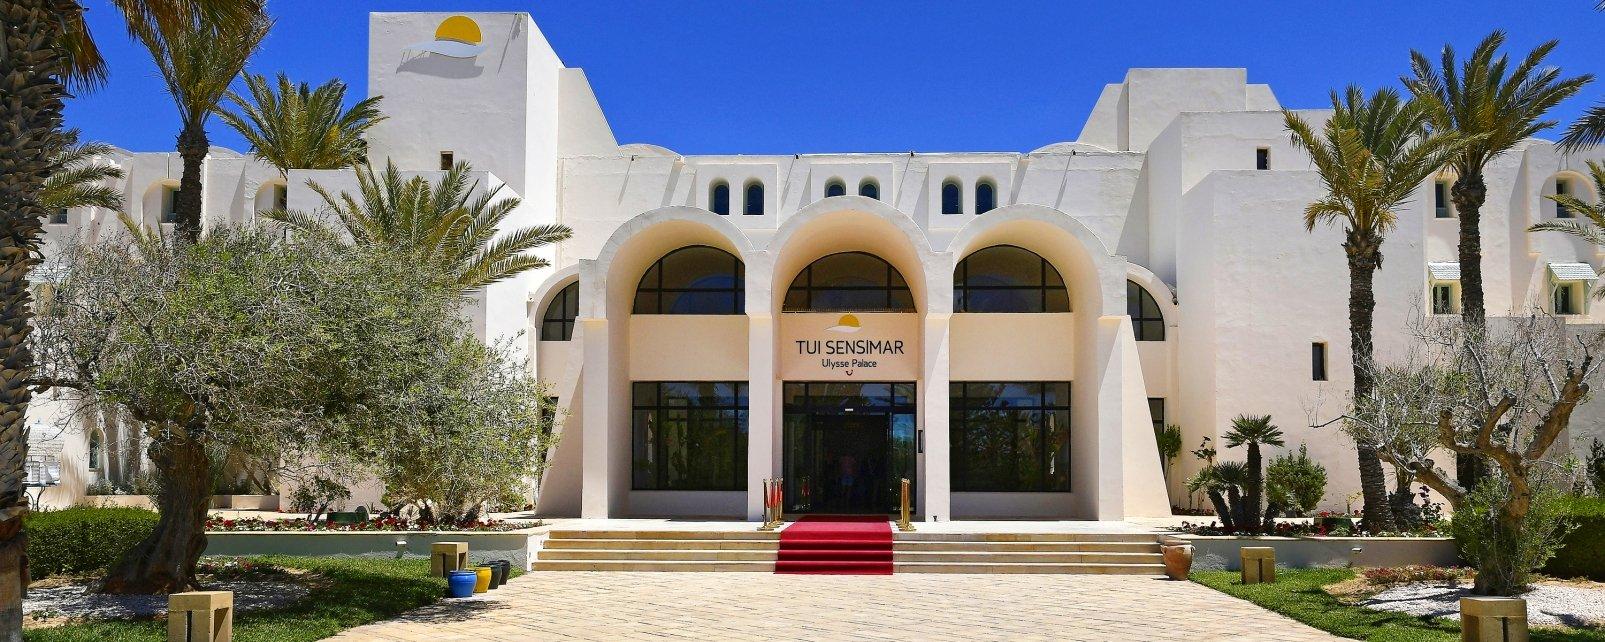 TUI Sensimar Ulysse Resort Thalasso